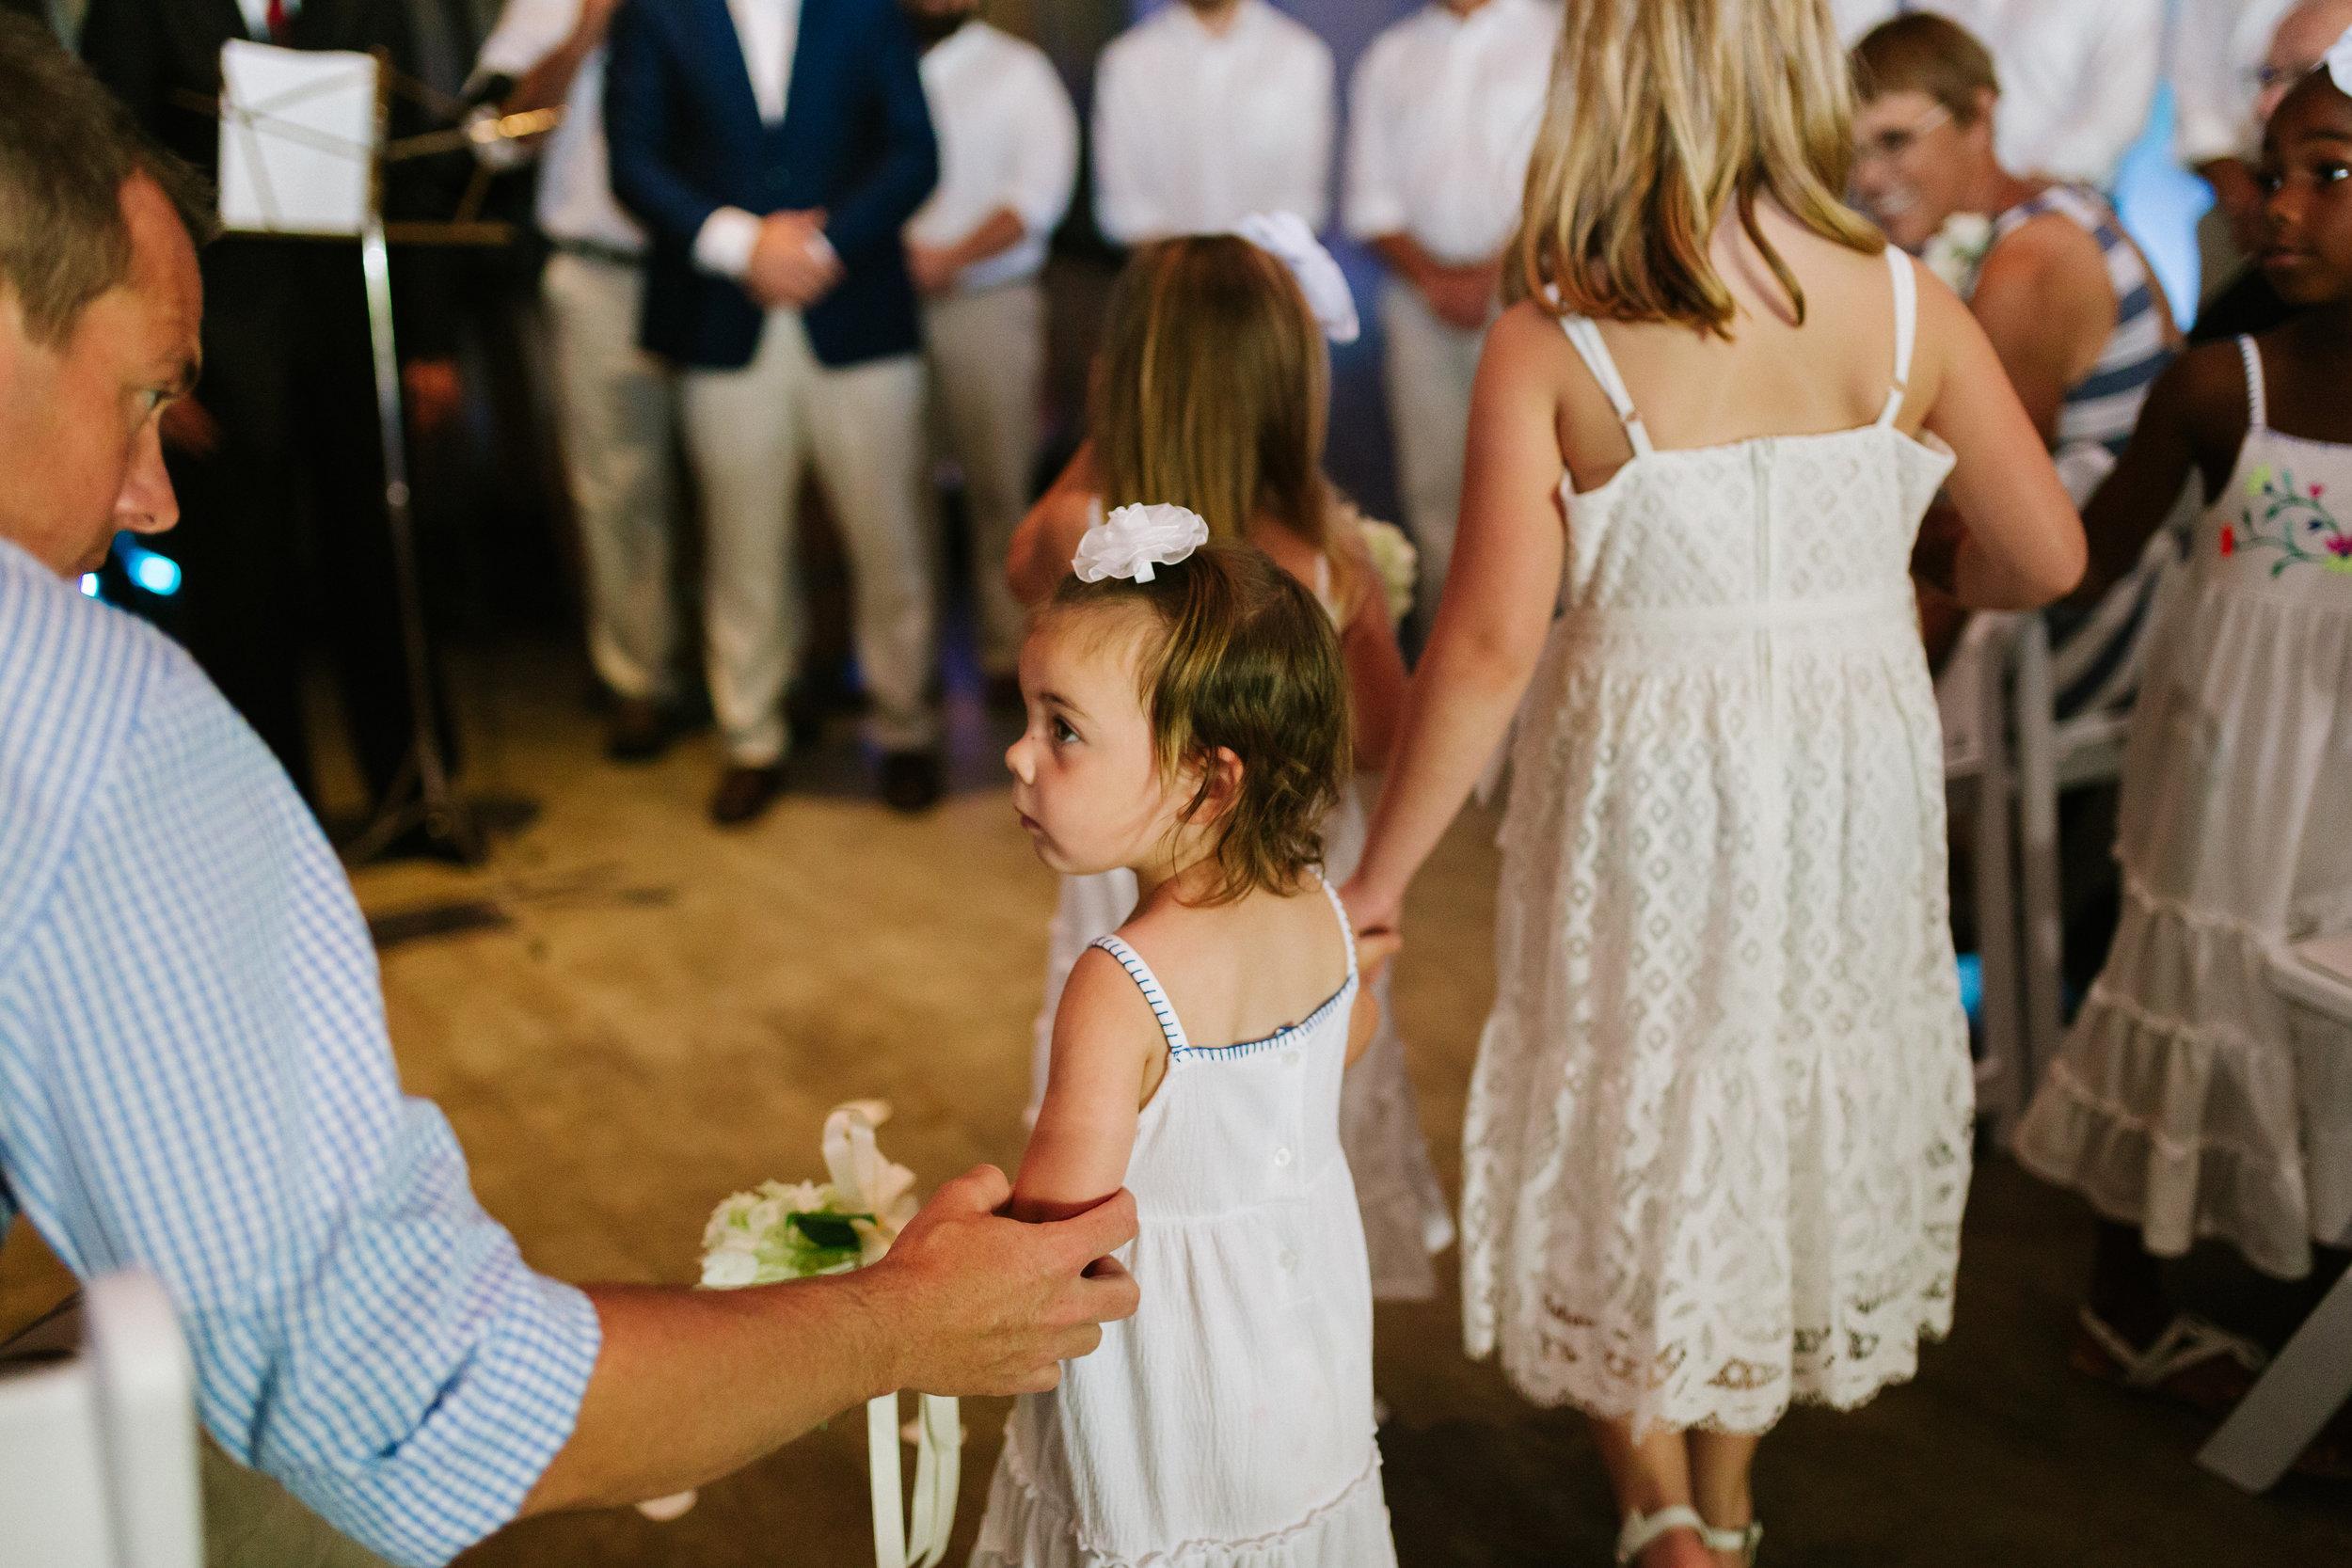 2017.09.16 Ashley and Chuck O'Day Quantam Leap Winery Wedding (132 of 462).jpg